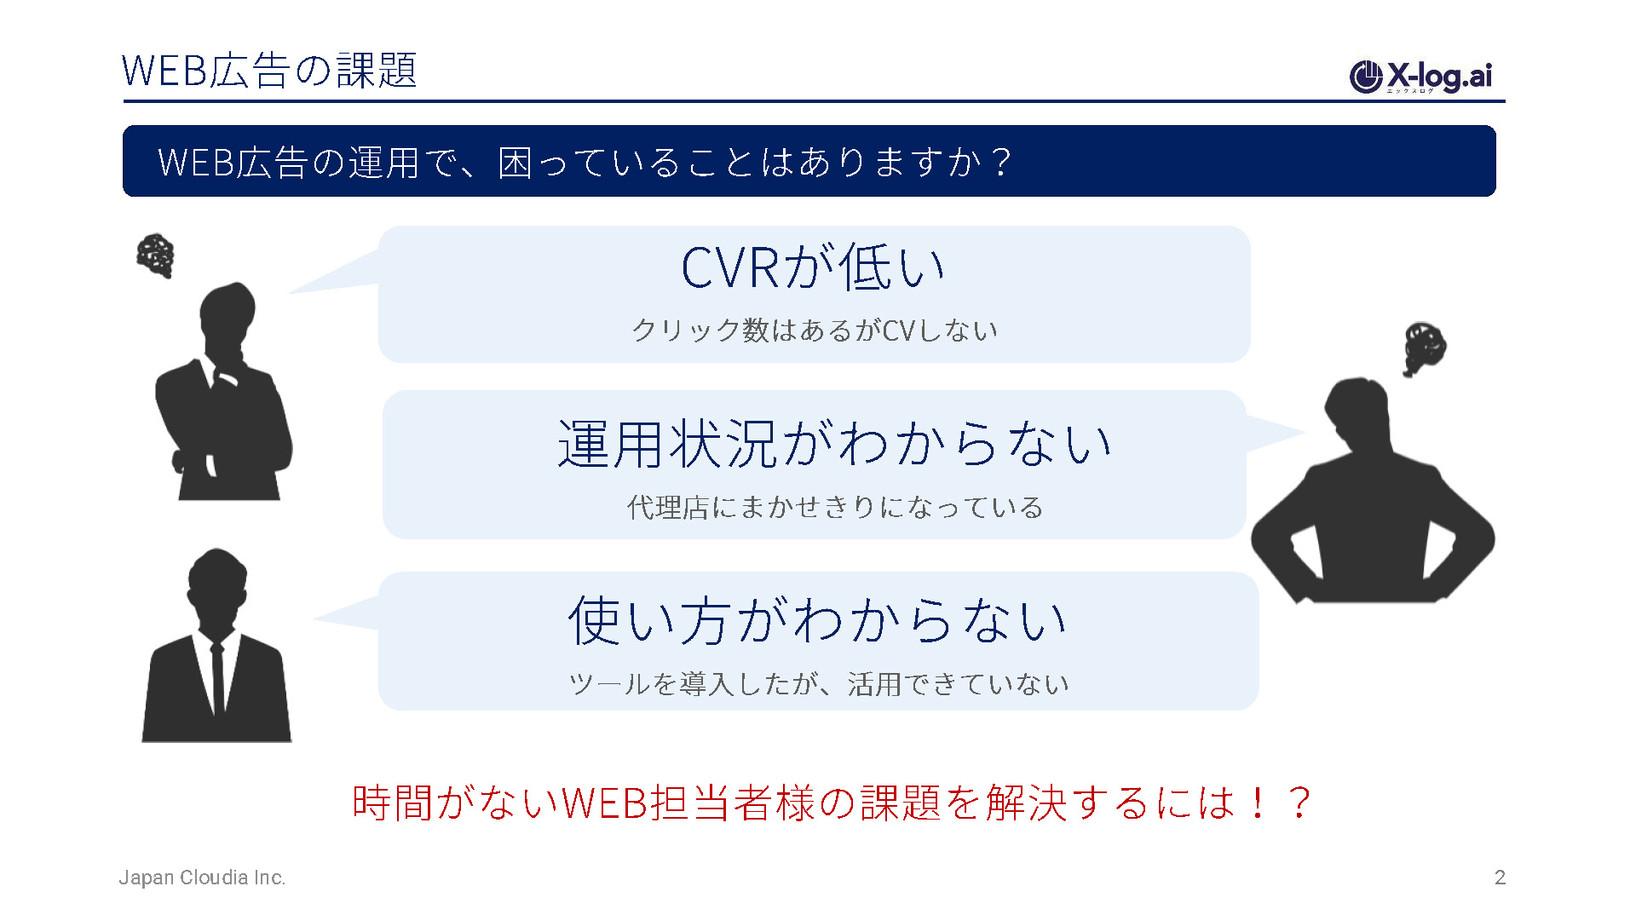 X-log.aiご案内資料_ページ_02.jpg